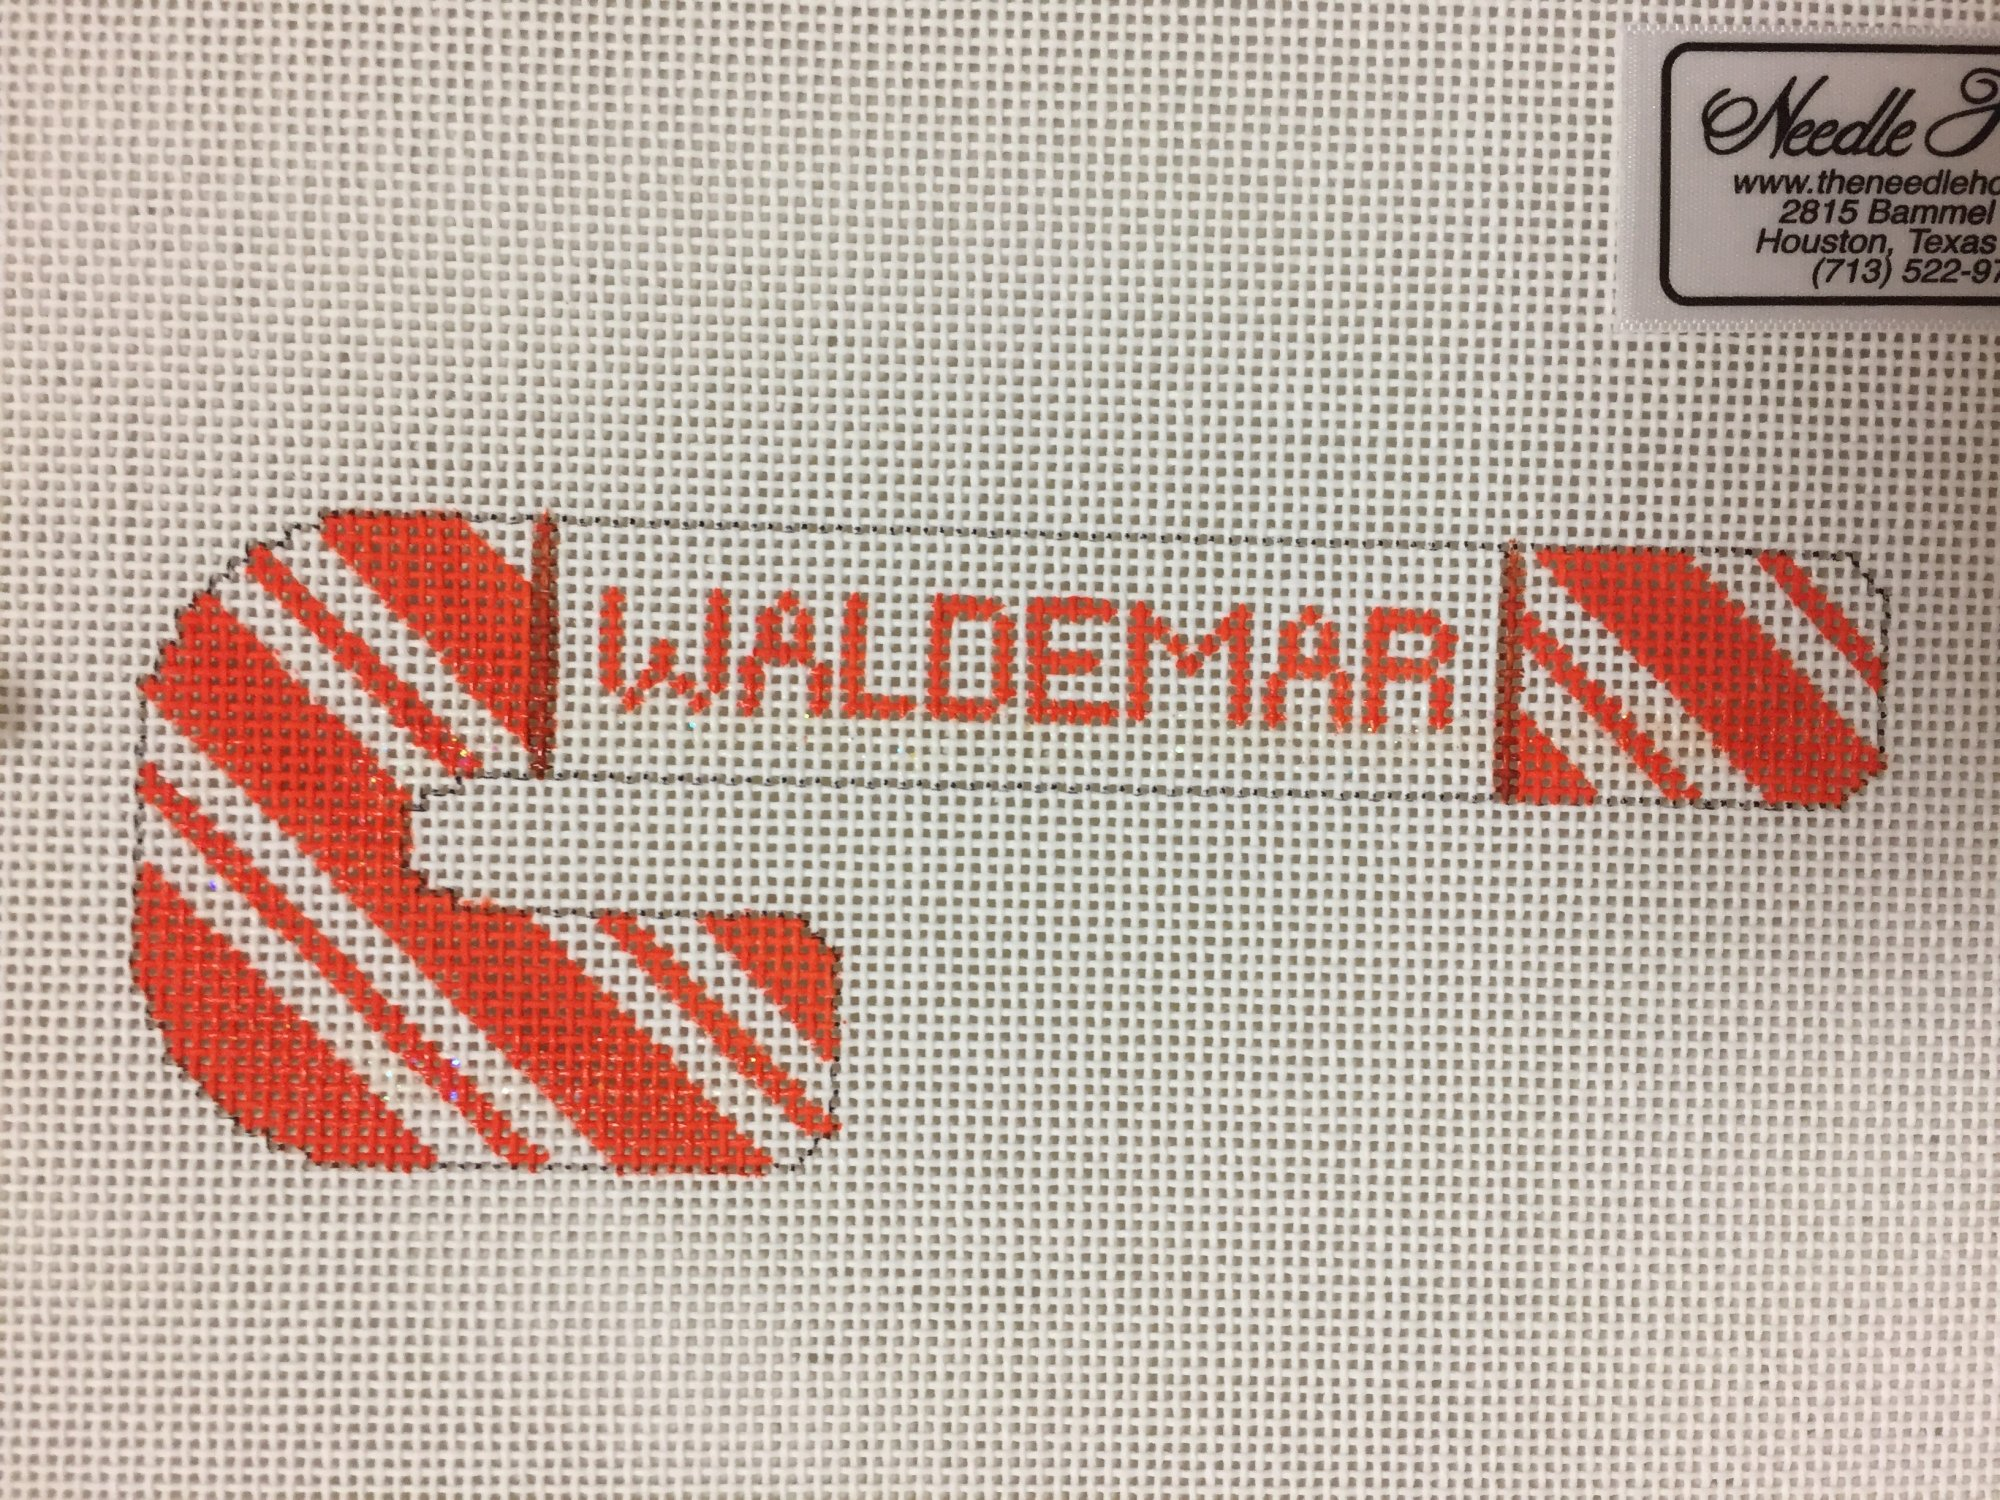 CD/ WALDEMAR Candy Cane